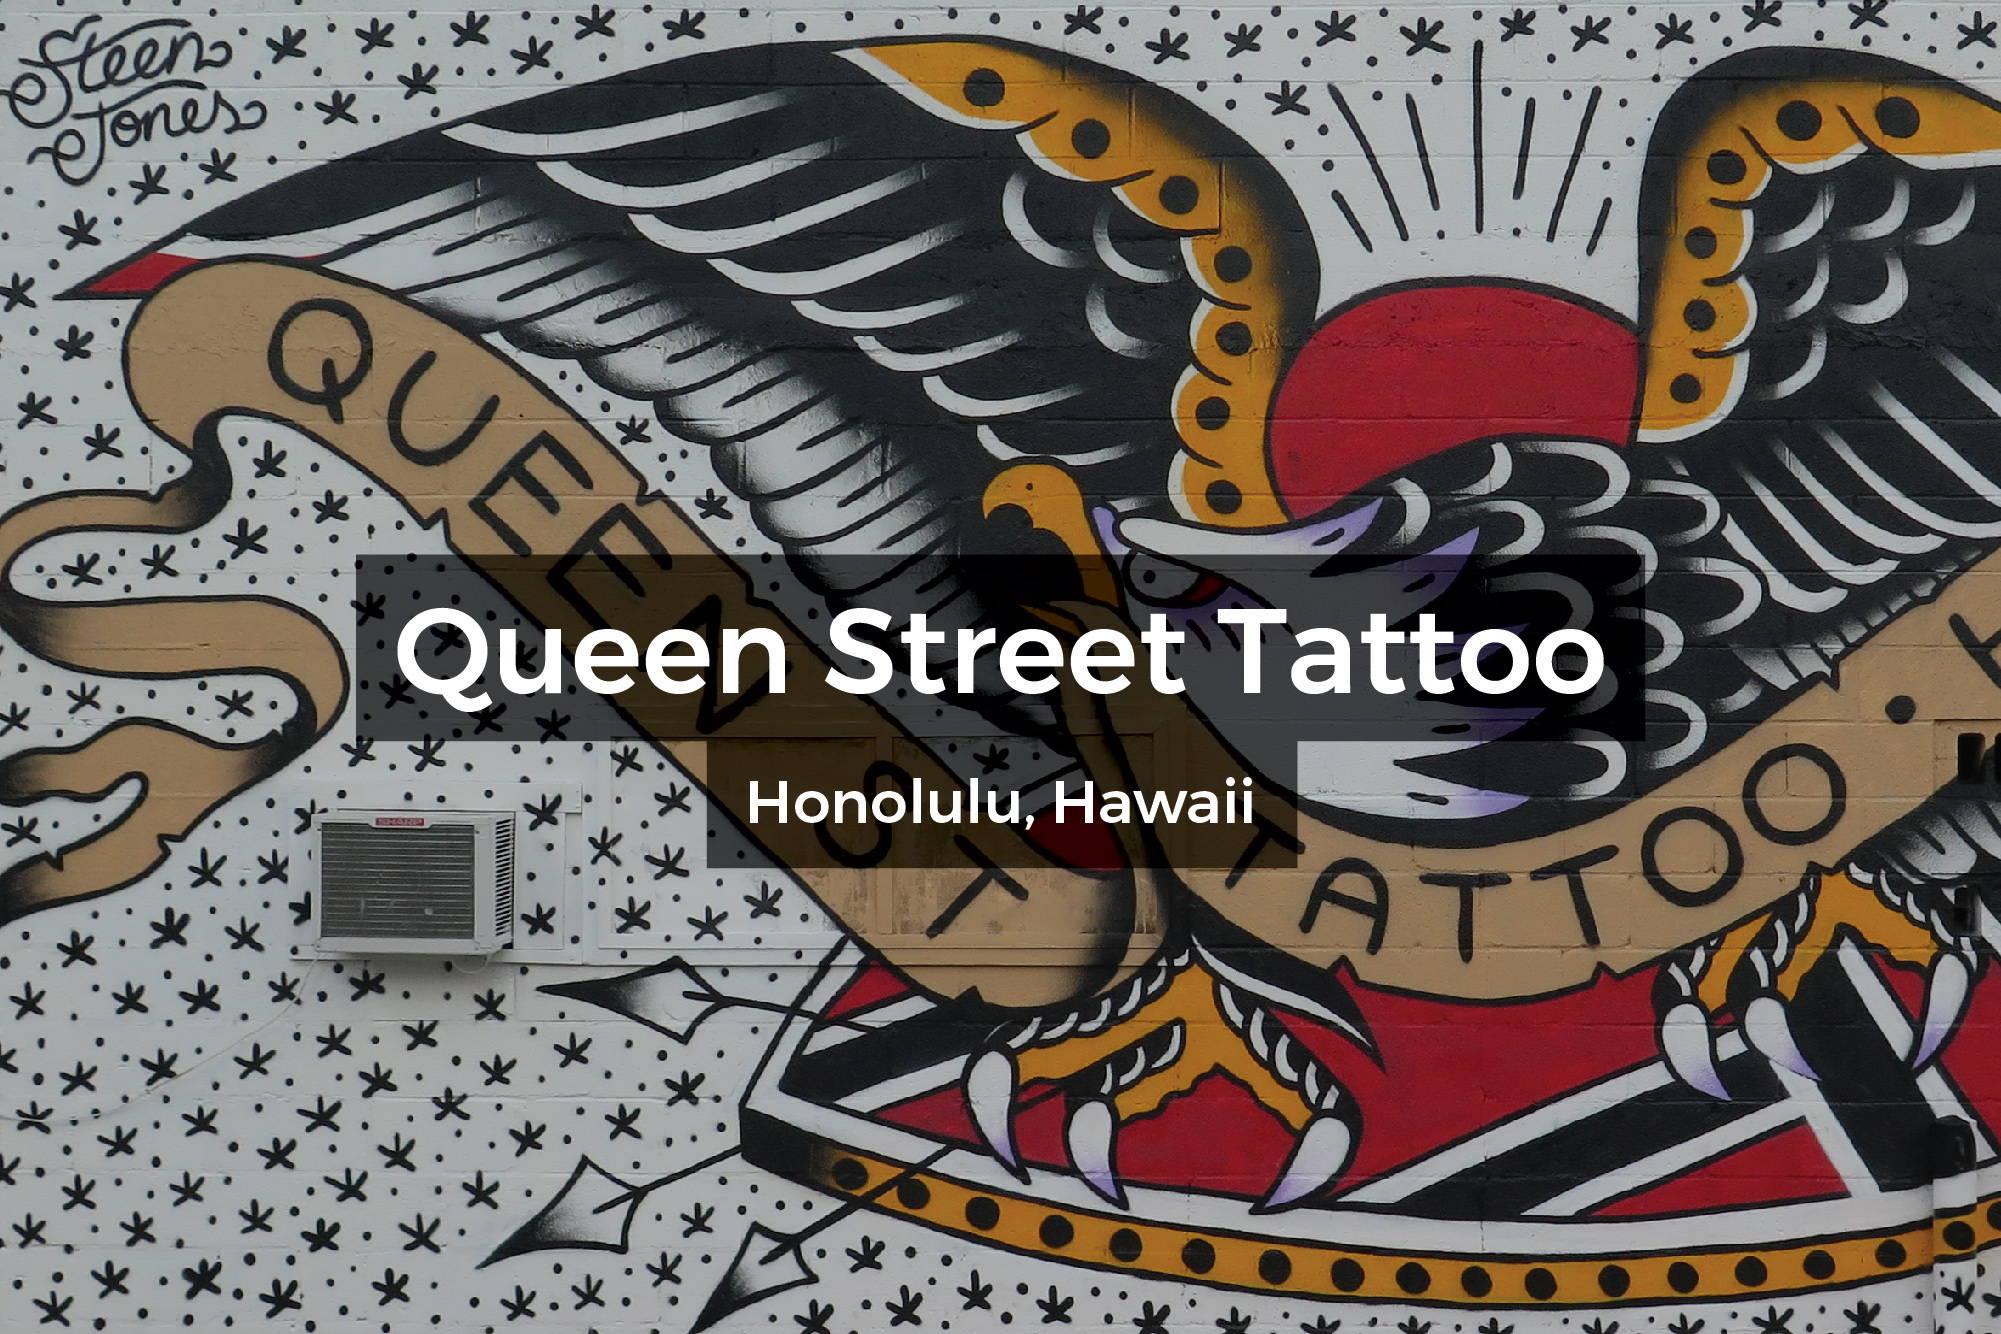 Queen Street Tattoo mural in Honolulu, Hawaii by Steen Jones